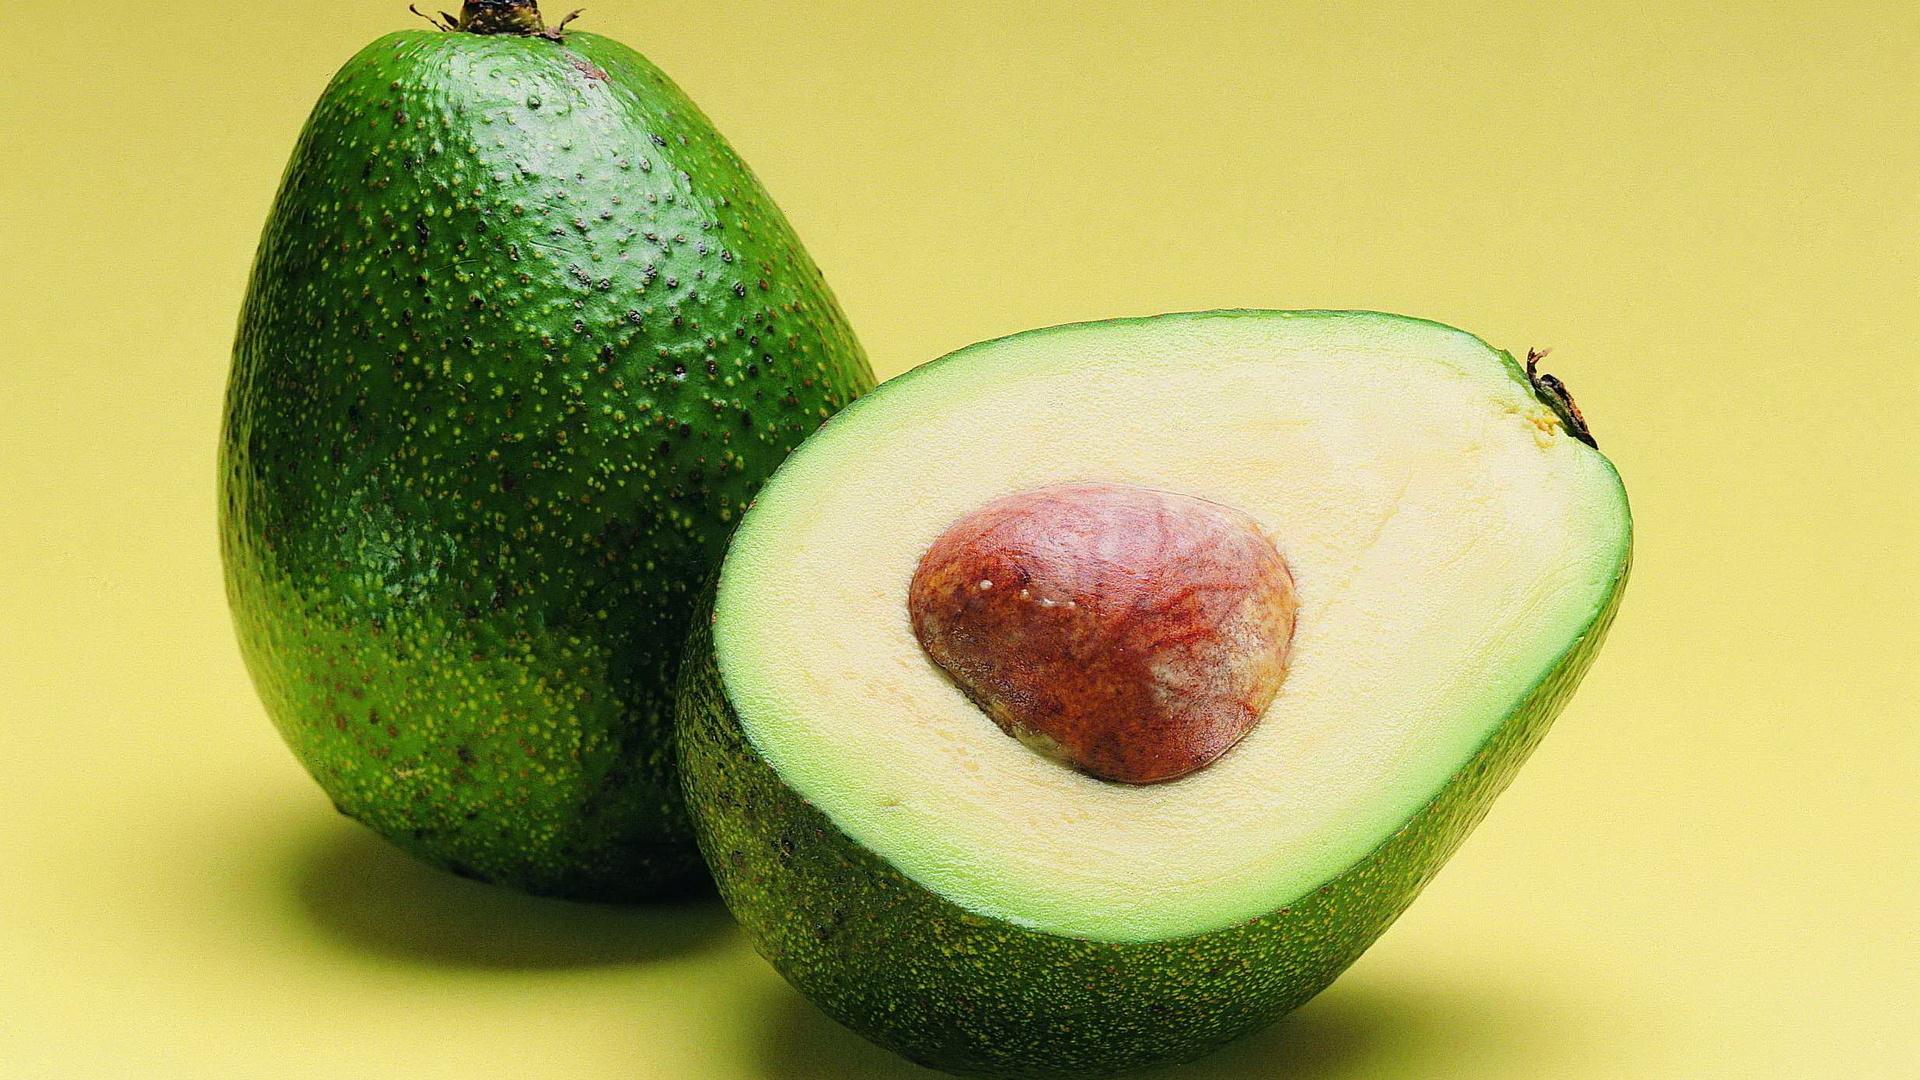 avocado desktop wallpaper 50129